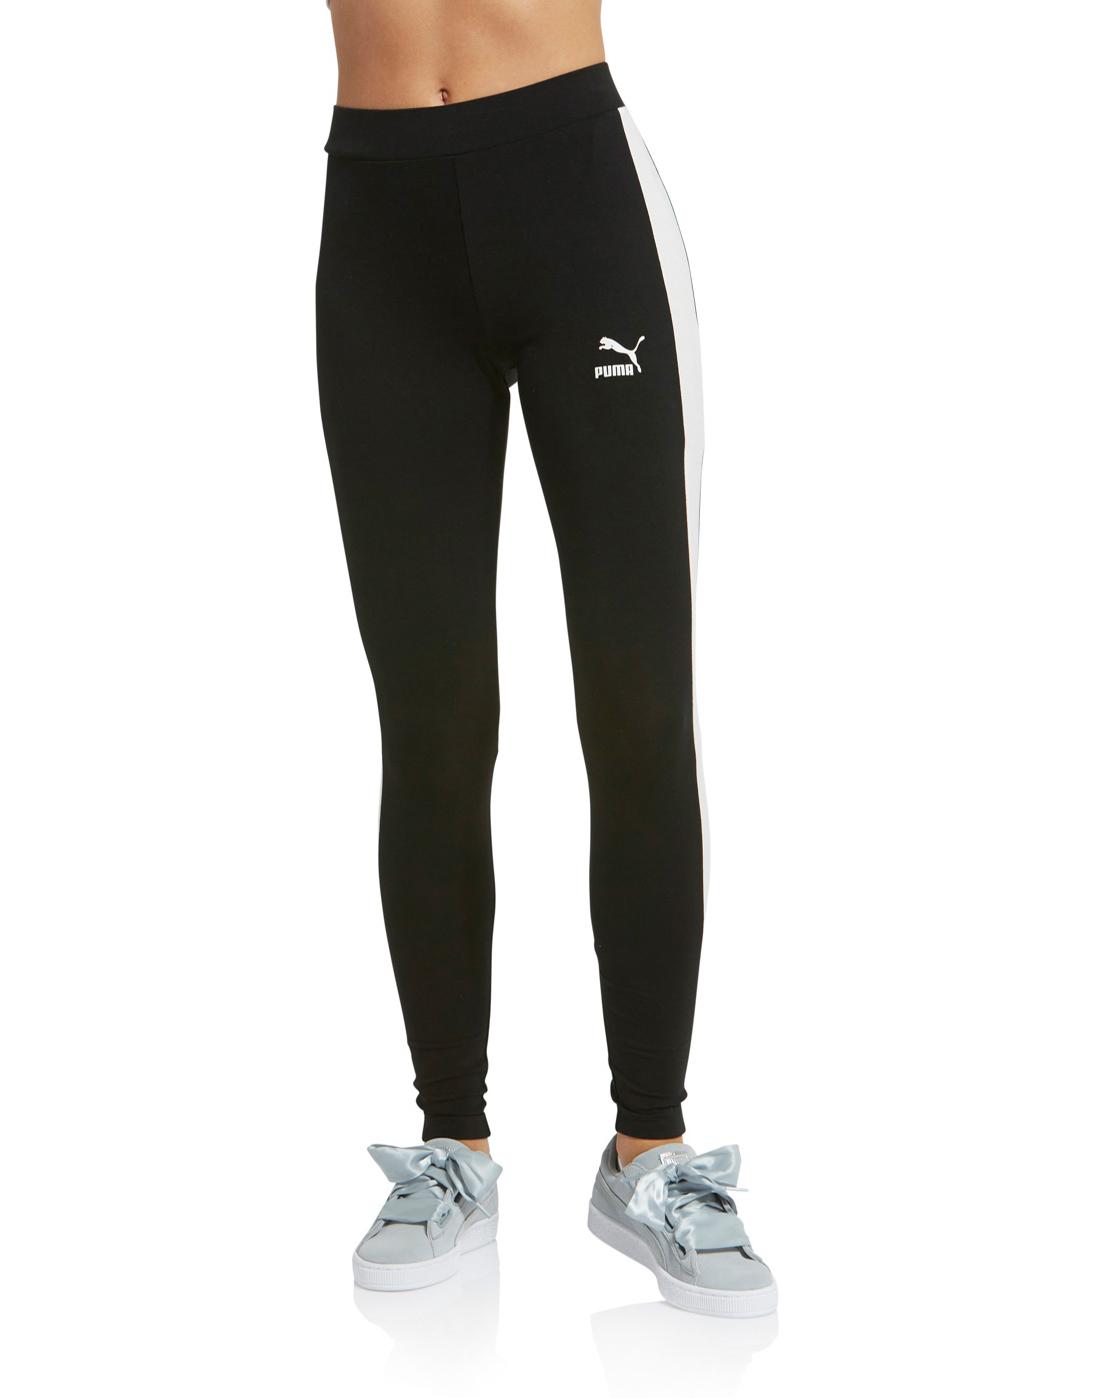 7100e06dec5fc Puma Womens Archive Legging | Life Style Sports